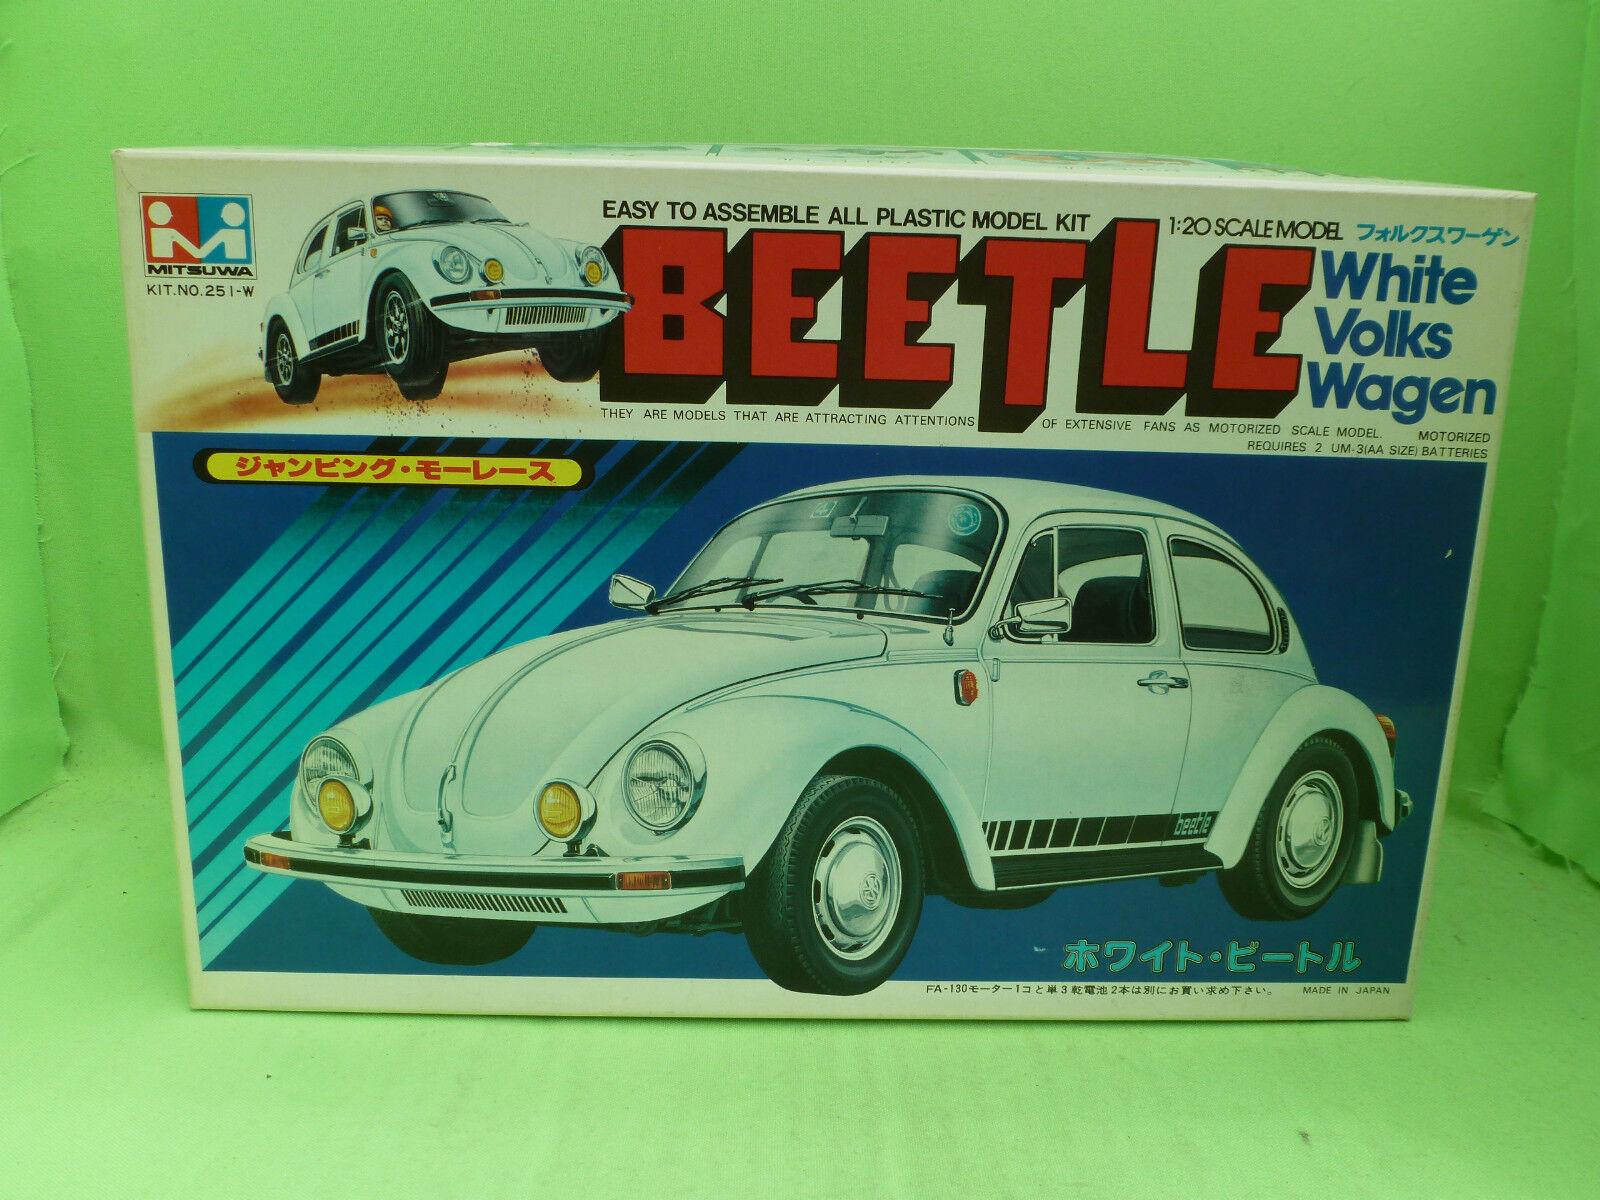 MITSUWA KIT 251 VW BEETLE KAFER VOLKSWAGEN 1 20 - UNBUILT IN BOX COMPLETE (2)